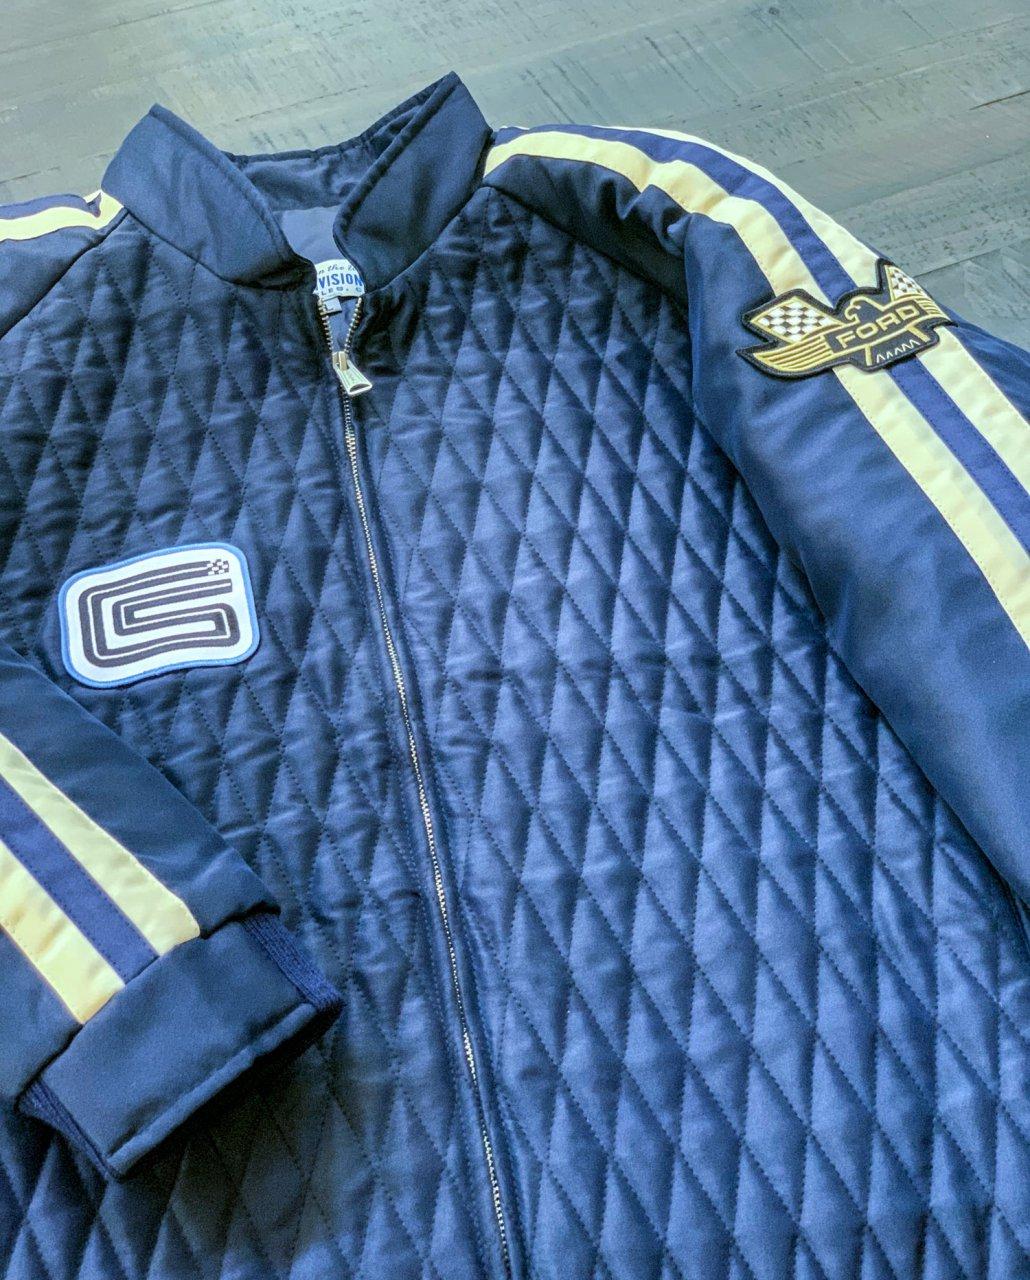 offer, Original Venice Crew offers limited Shelby Cobra jackets, ClassicCars.com Journal